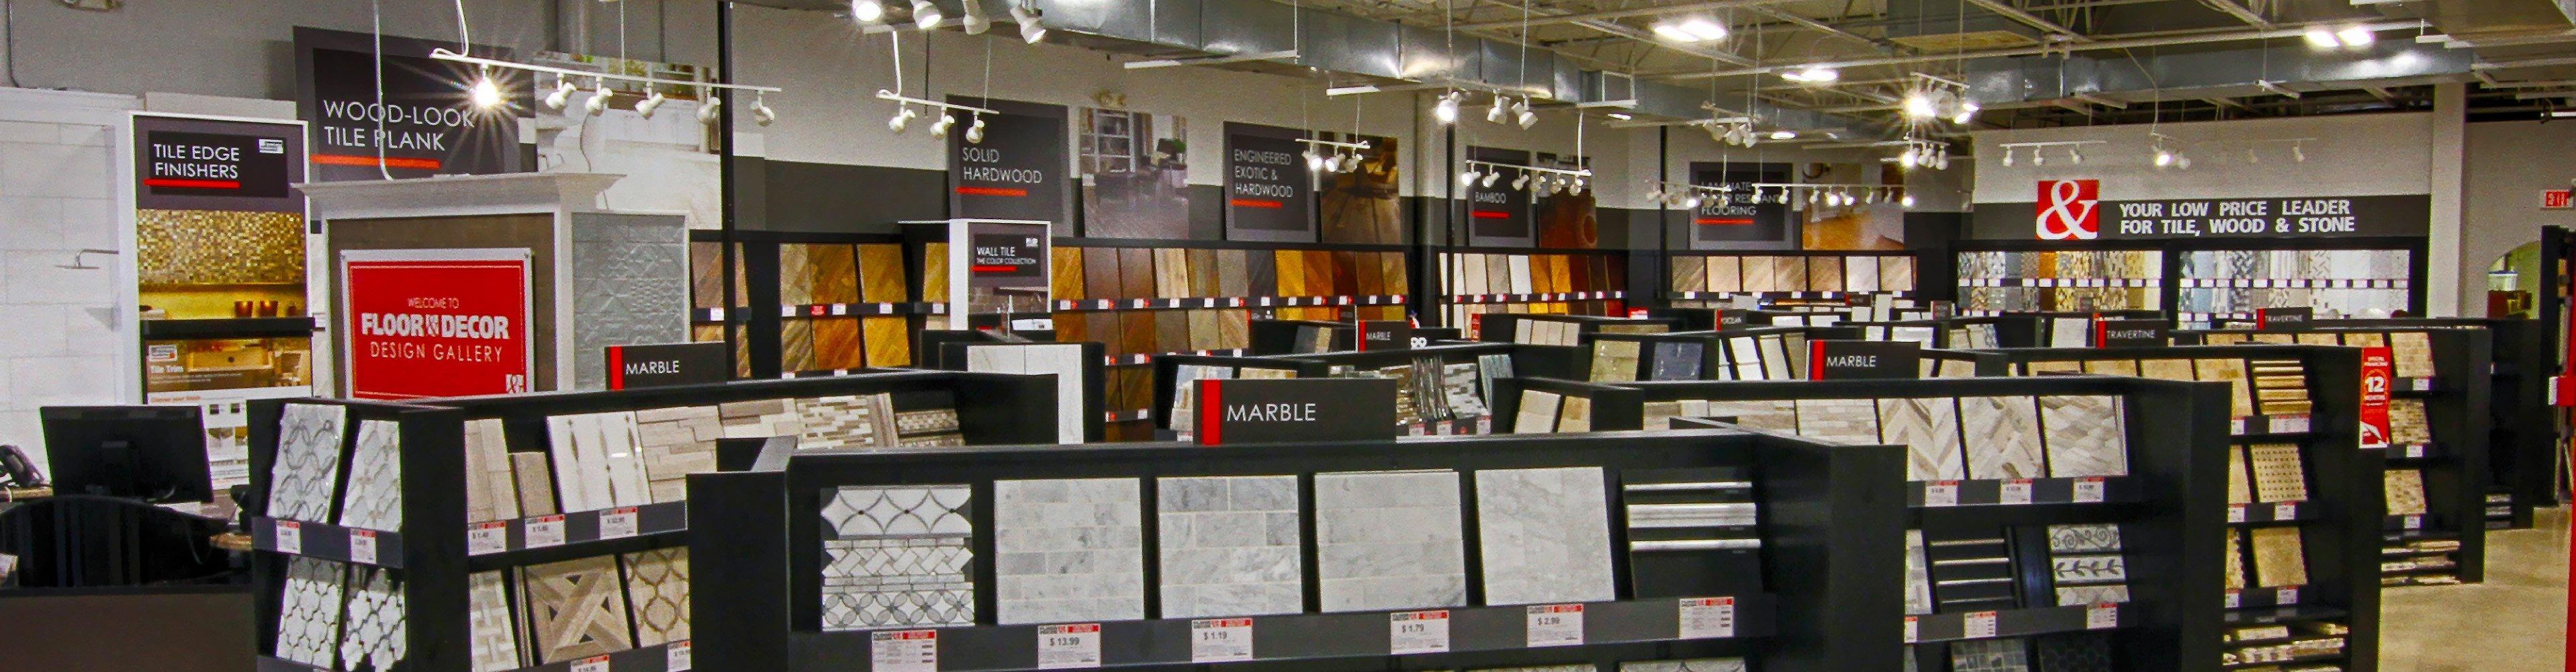 New Orleans LA Store Design Gallery Floor Decor - Floor tile retail stores